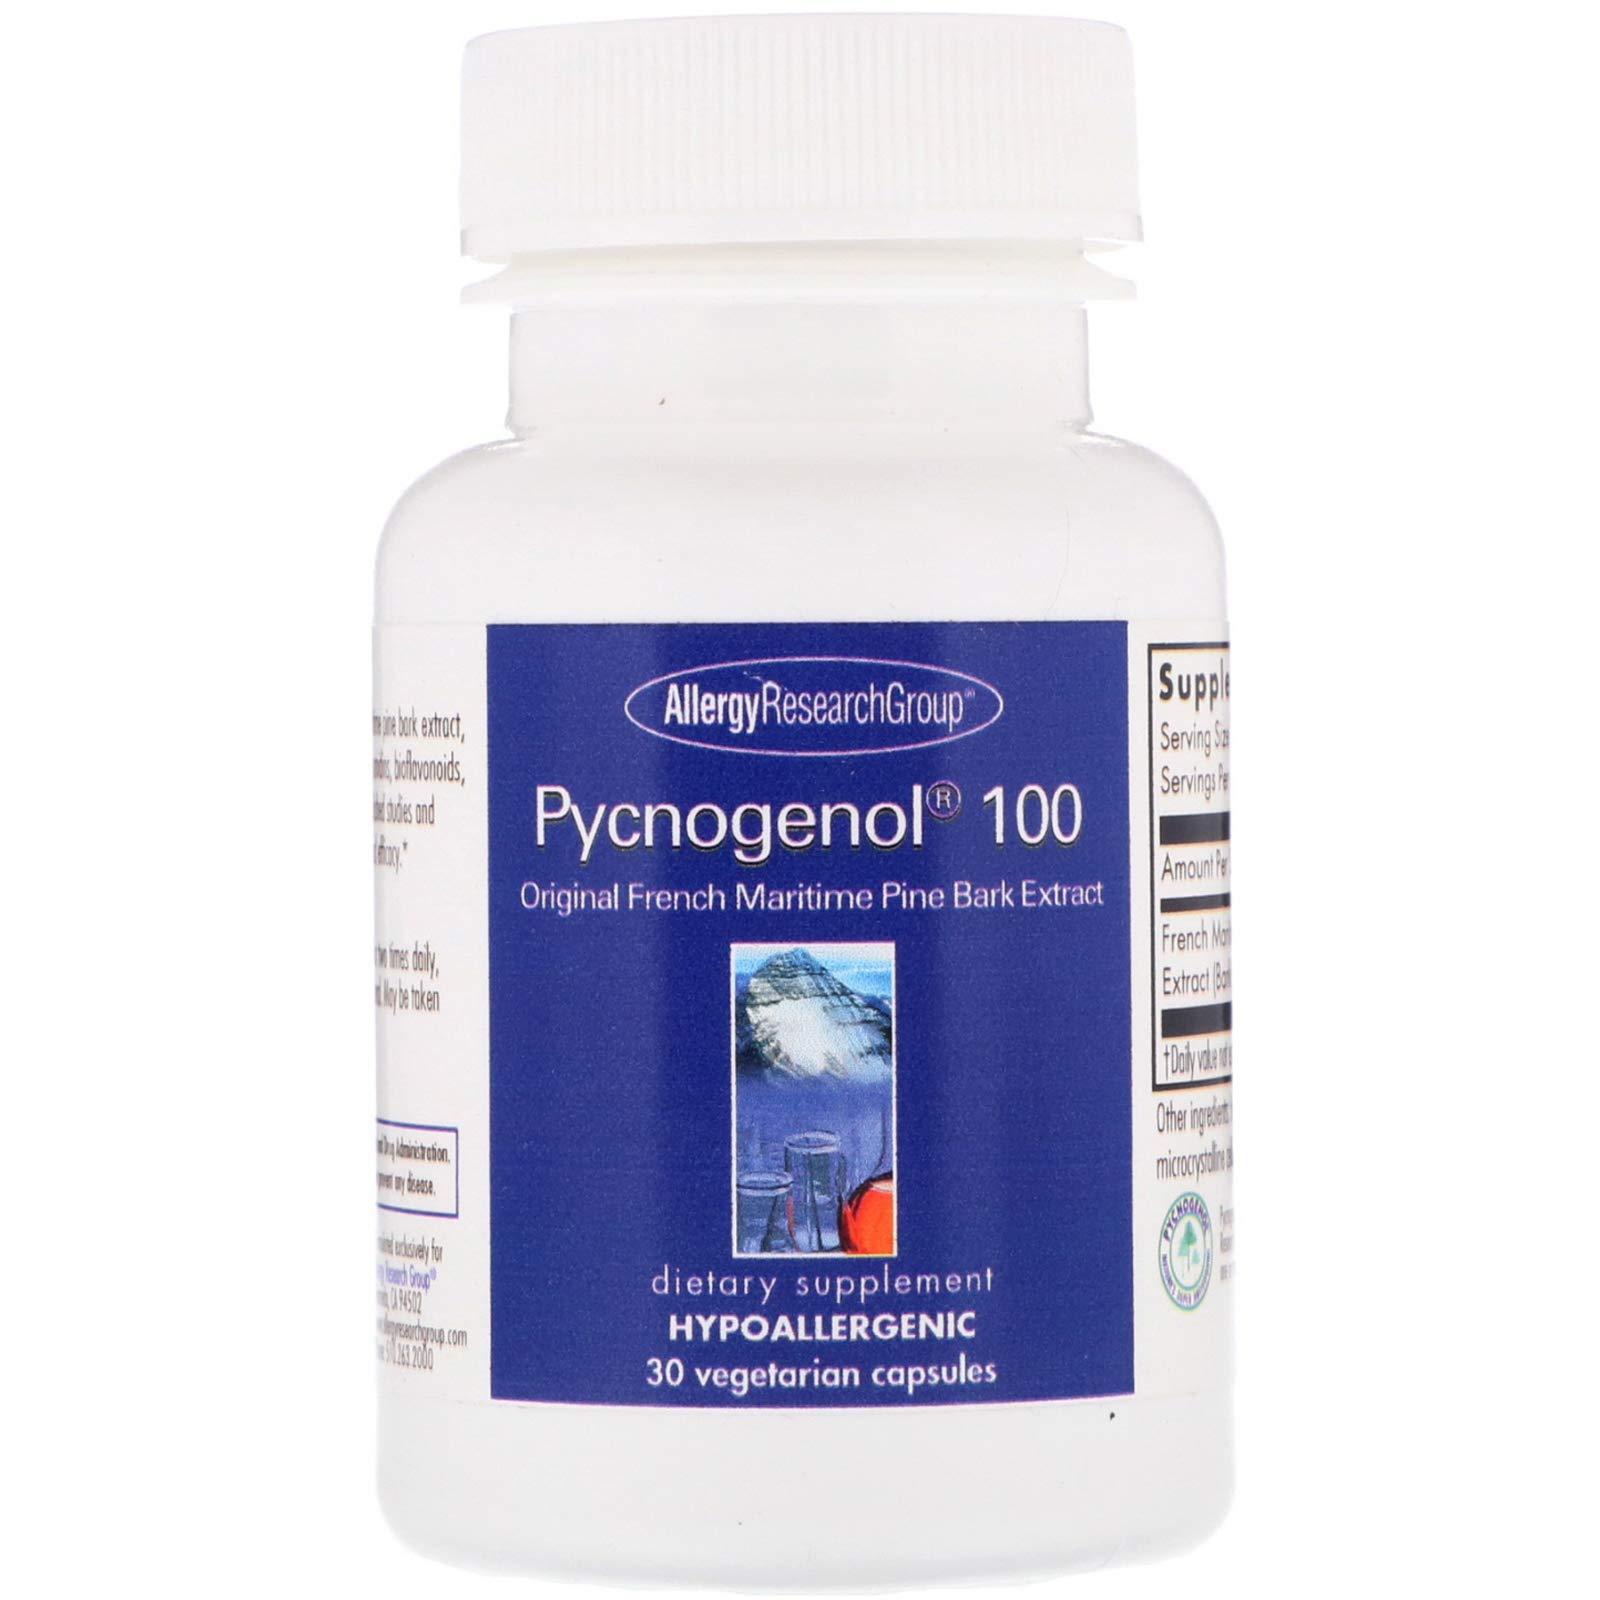 Allergy Research Group Pycnogenol 100 30 Vegetarian Capsules